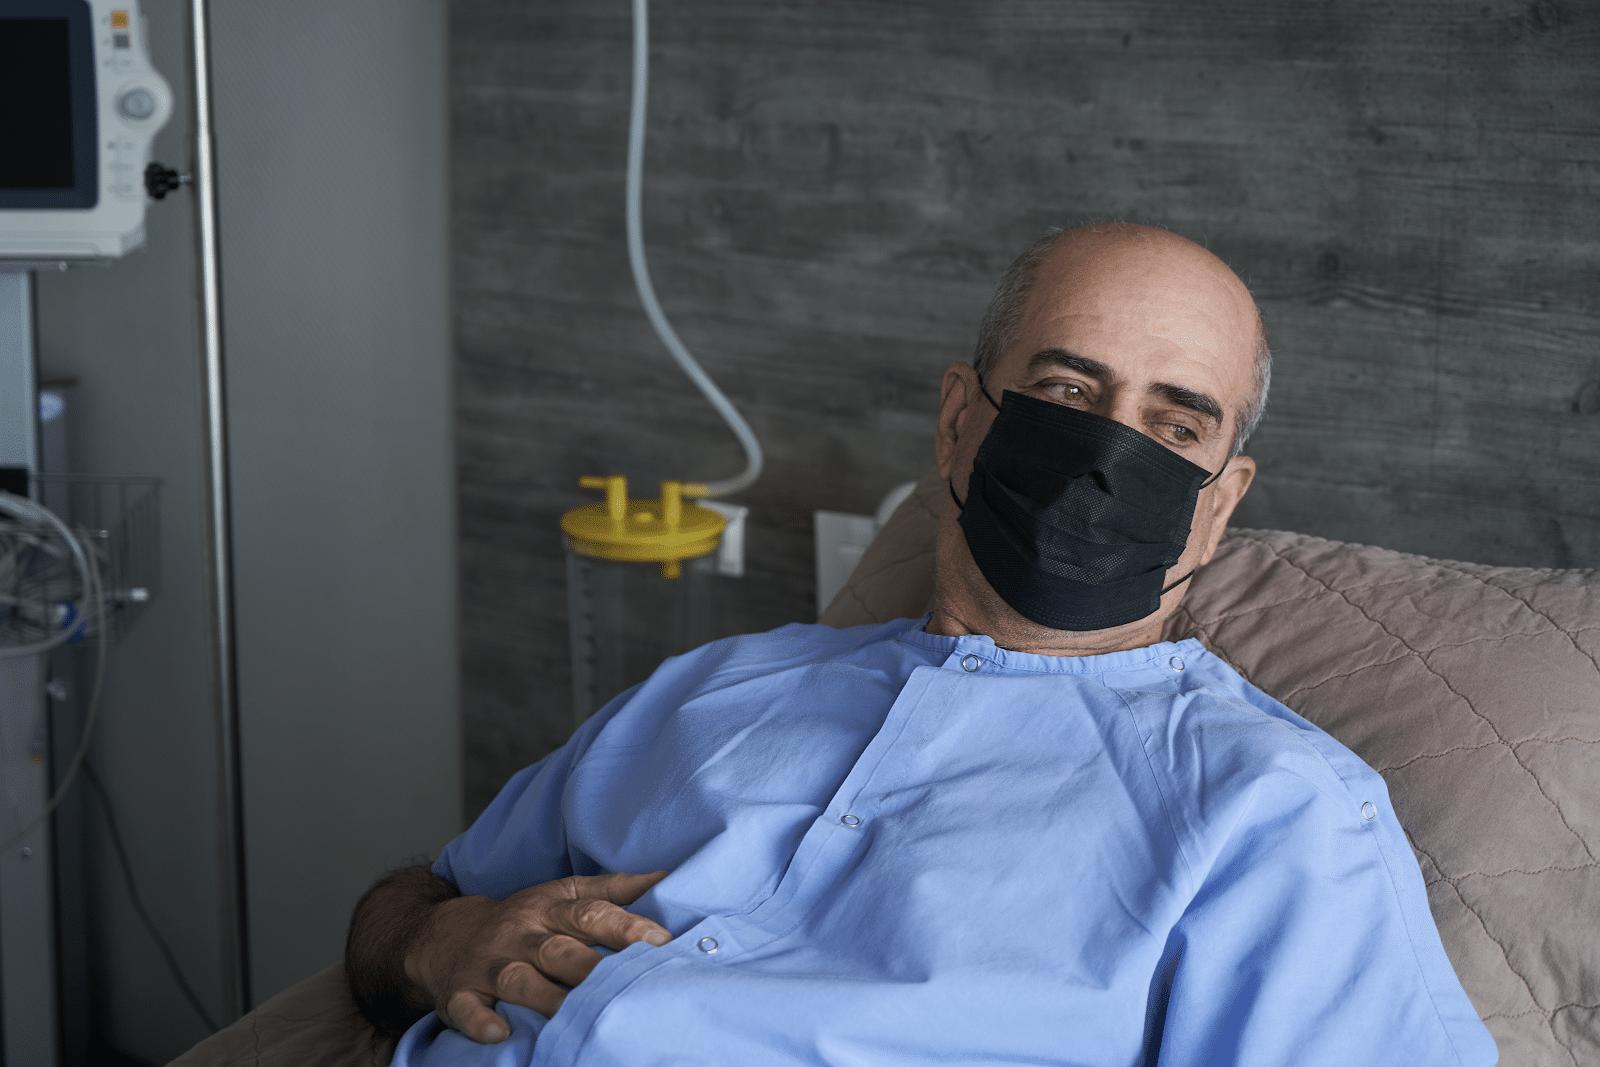 older-man-with-face-mask-on-hospital-bed